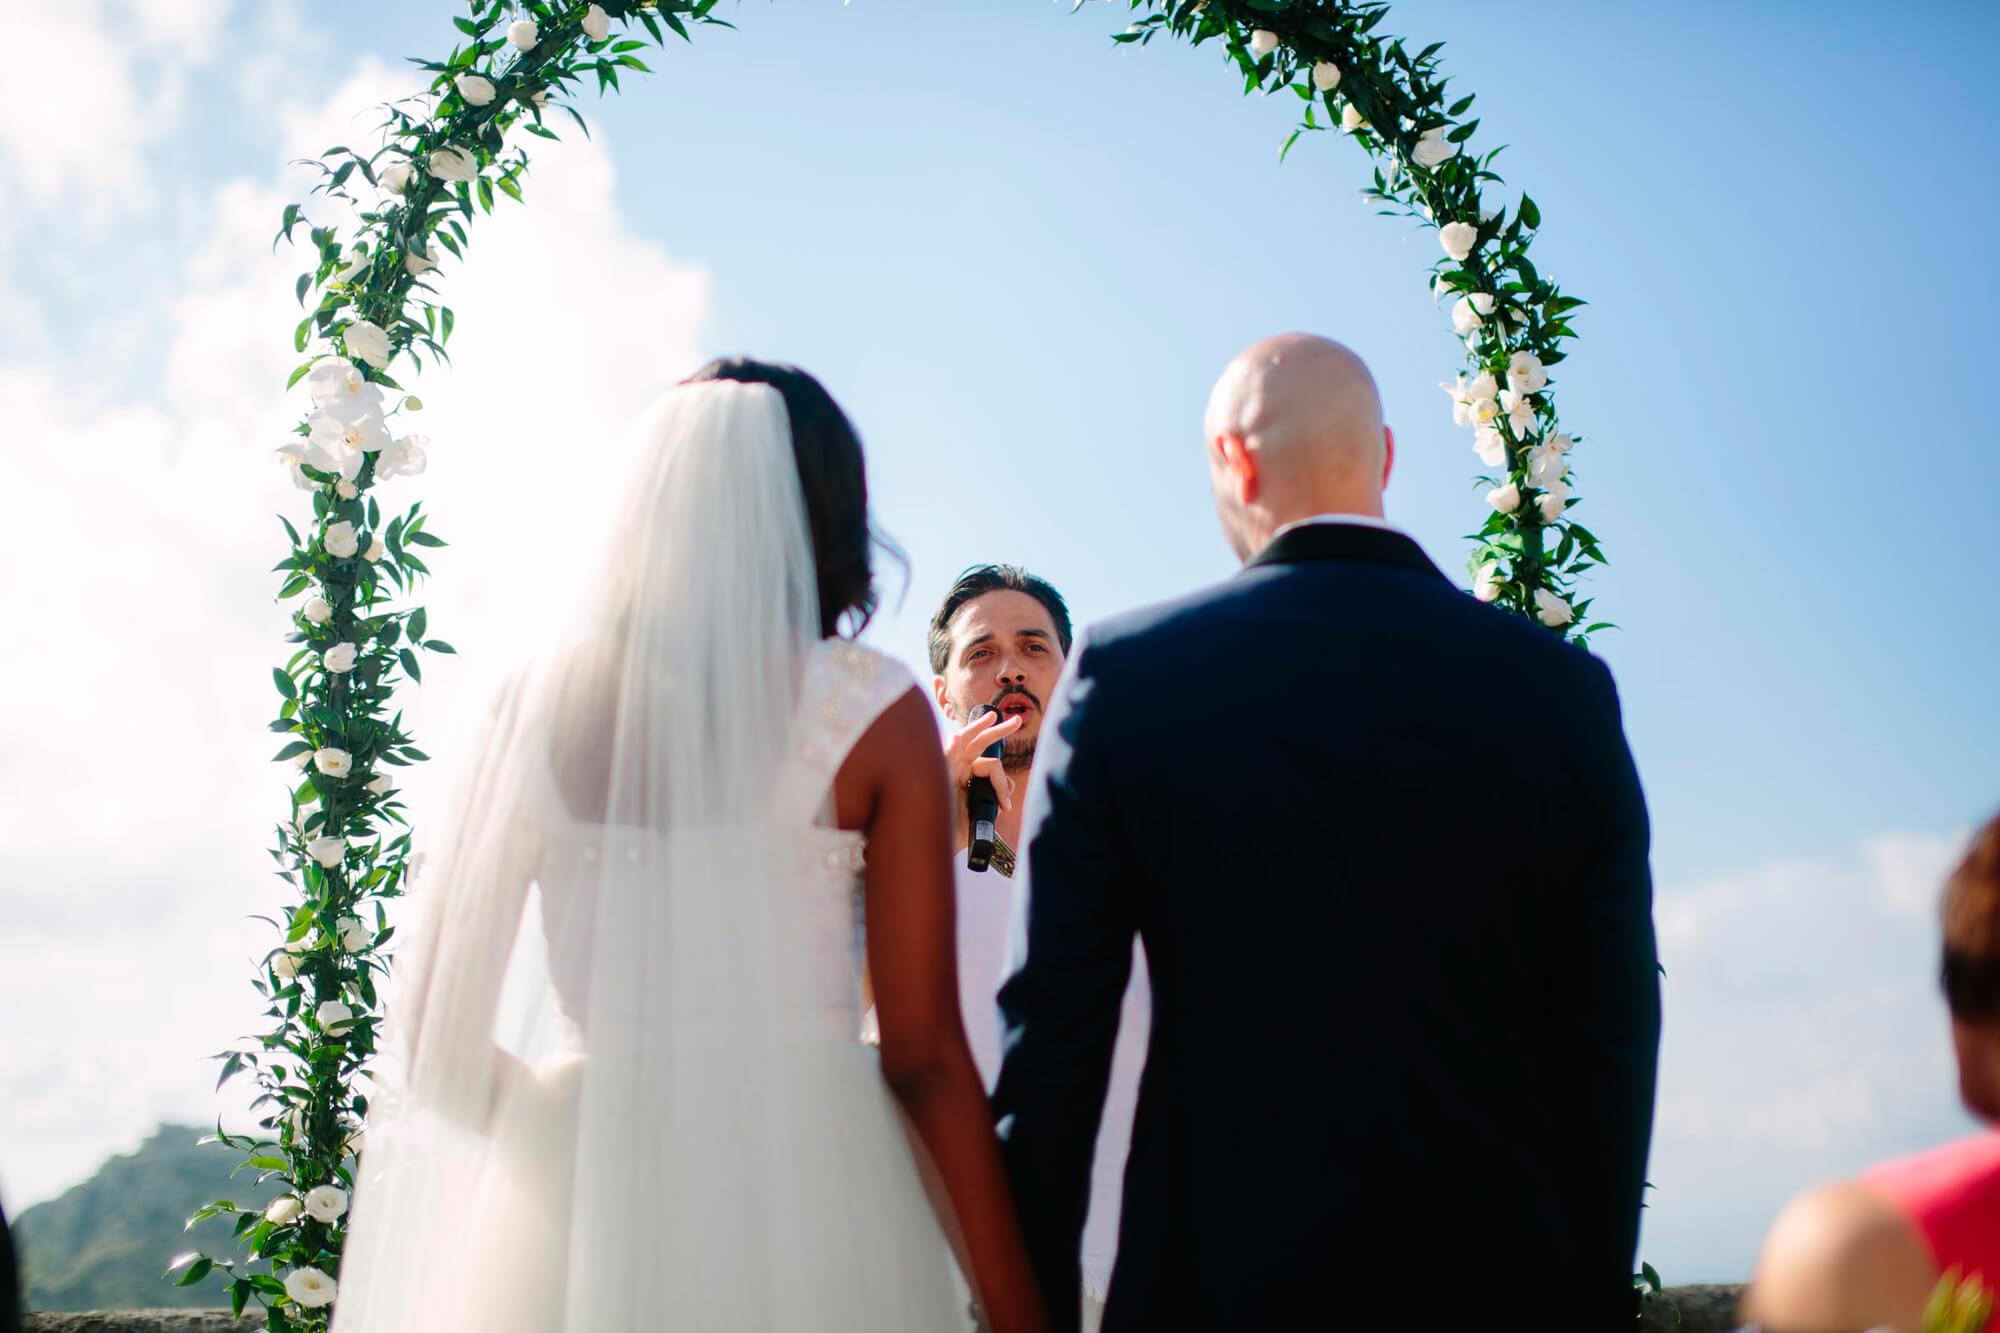 064-sorrento-wedding-photographer.jpg